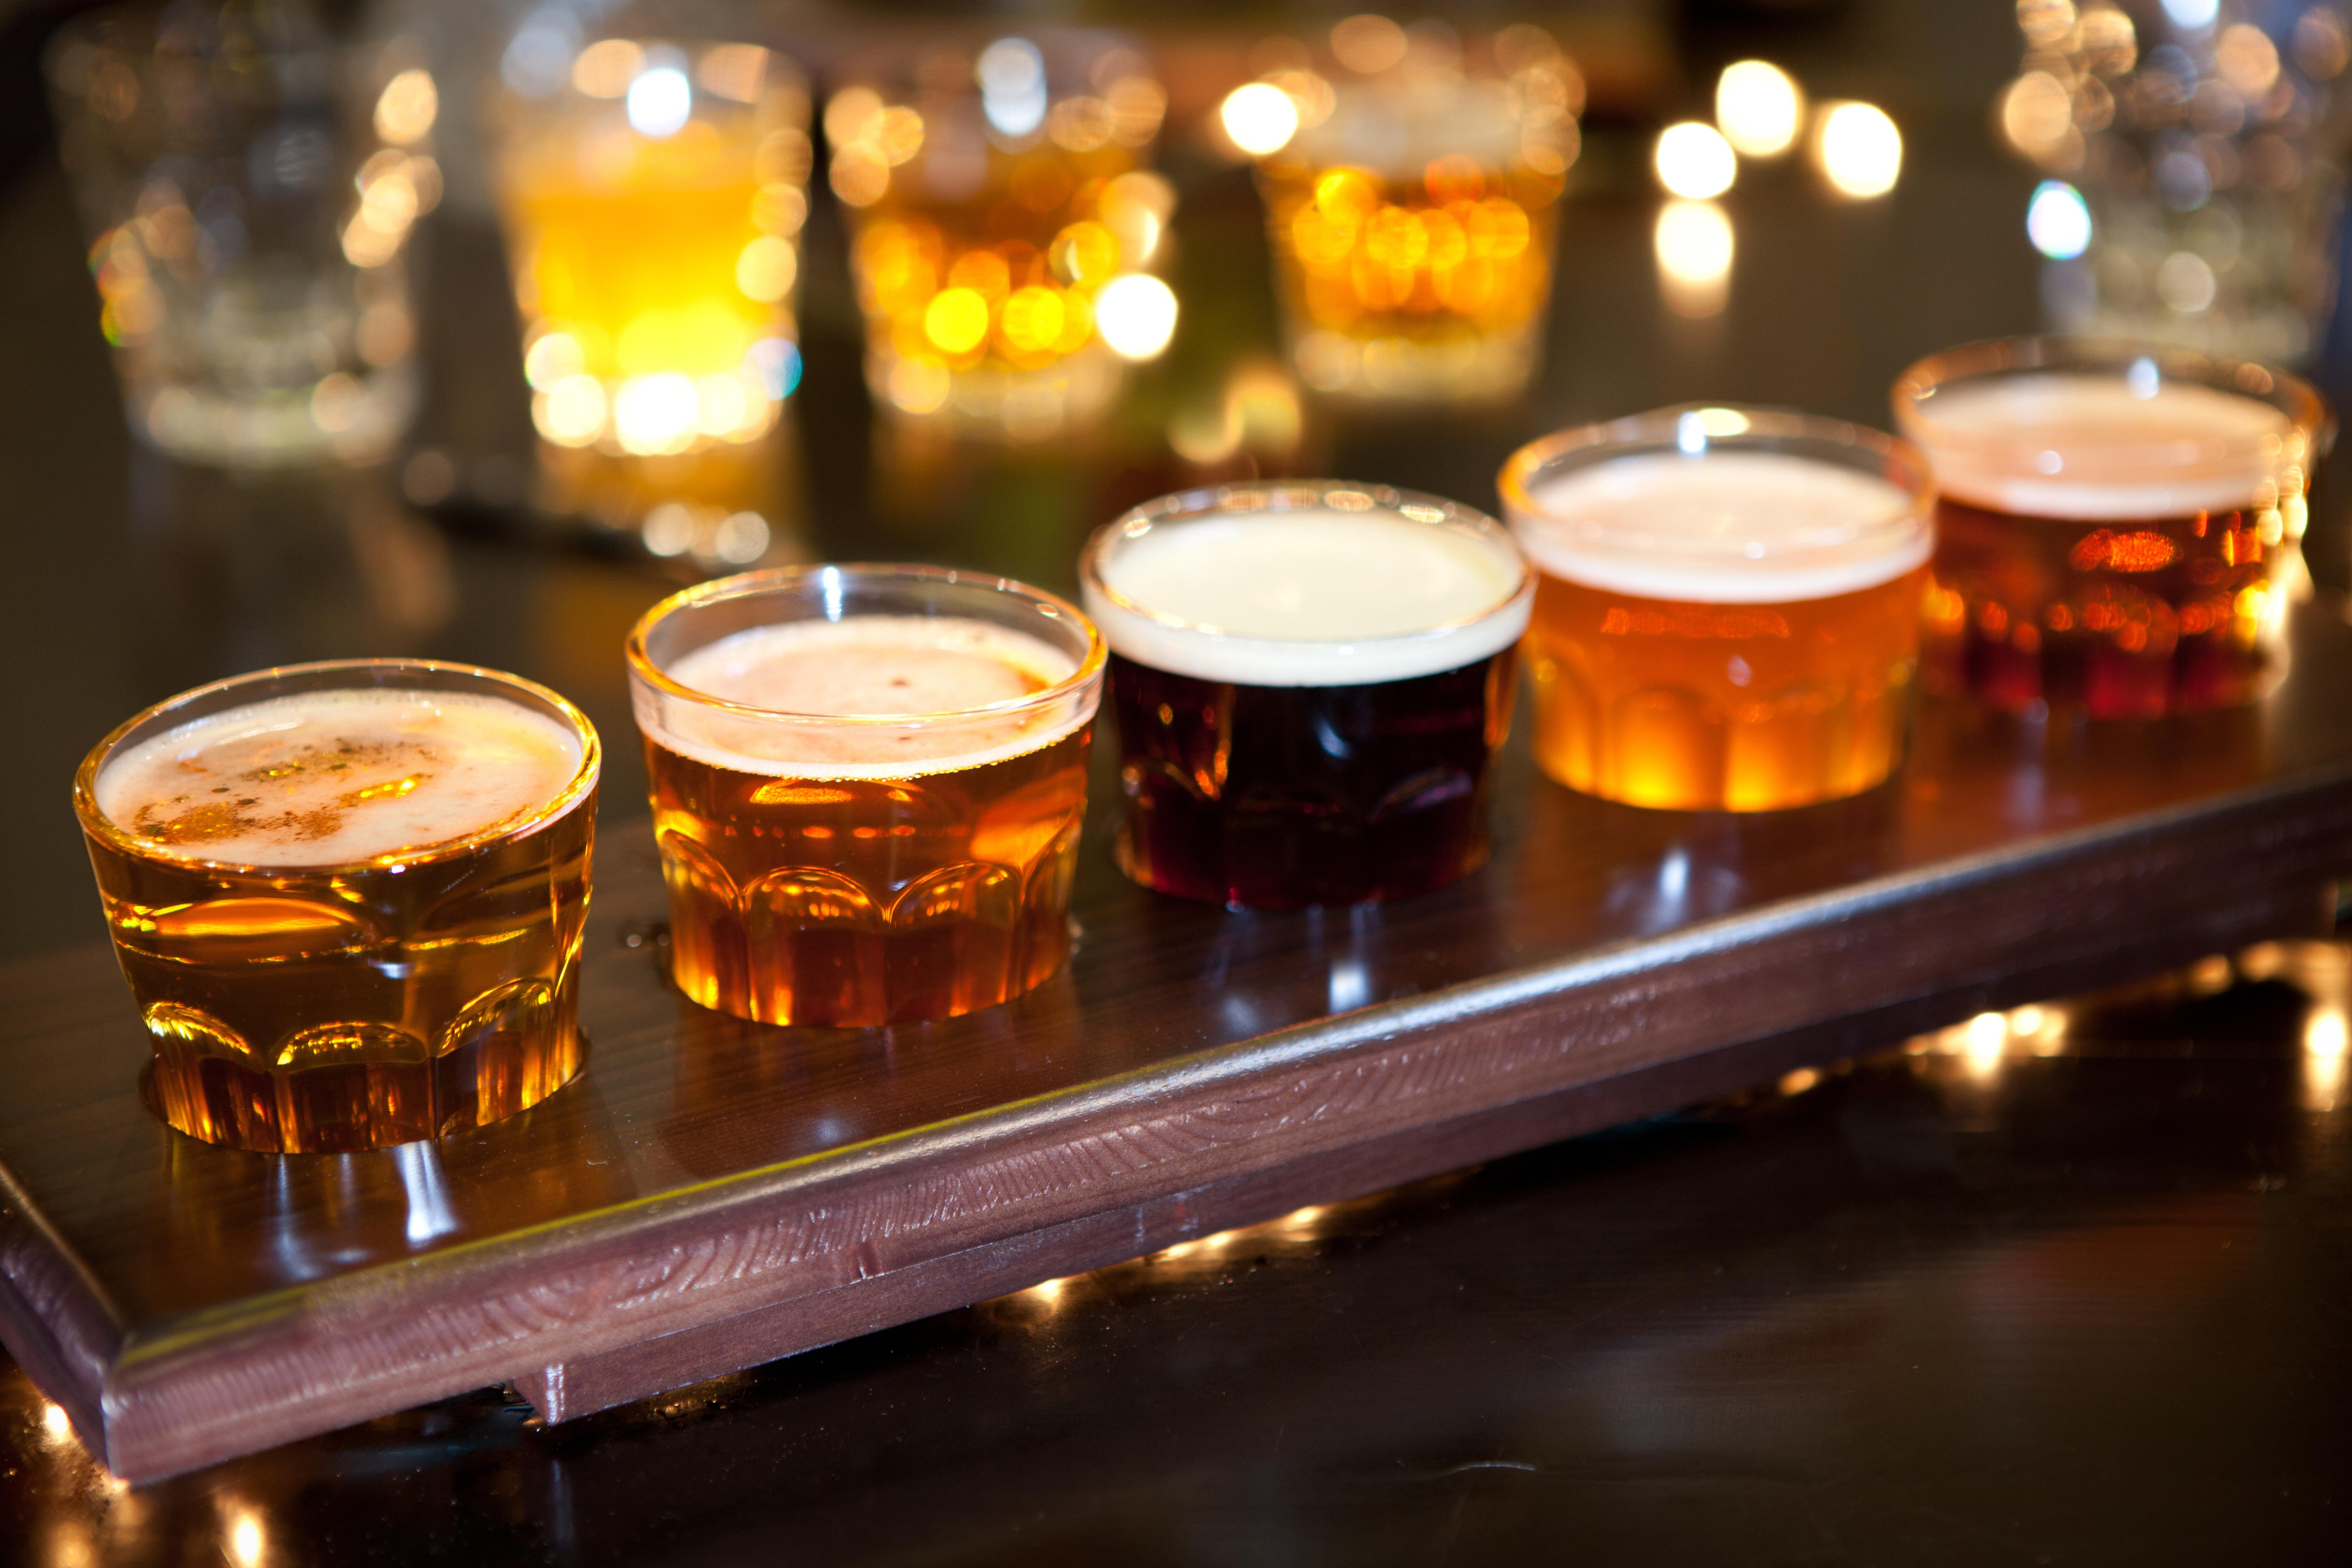 Beer Samples - local pub